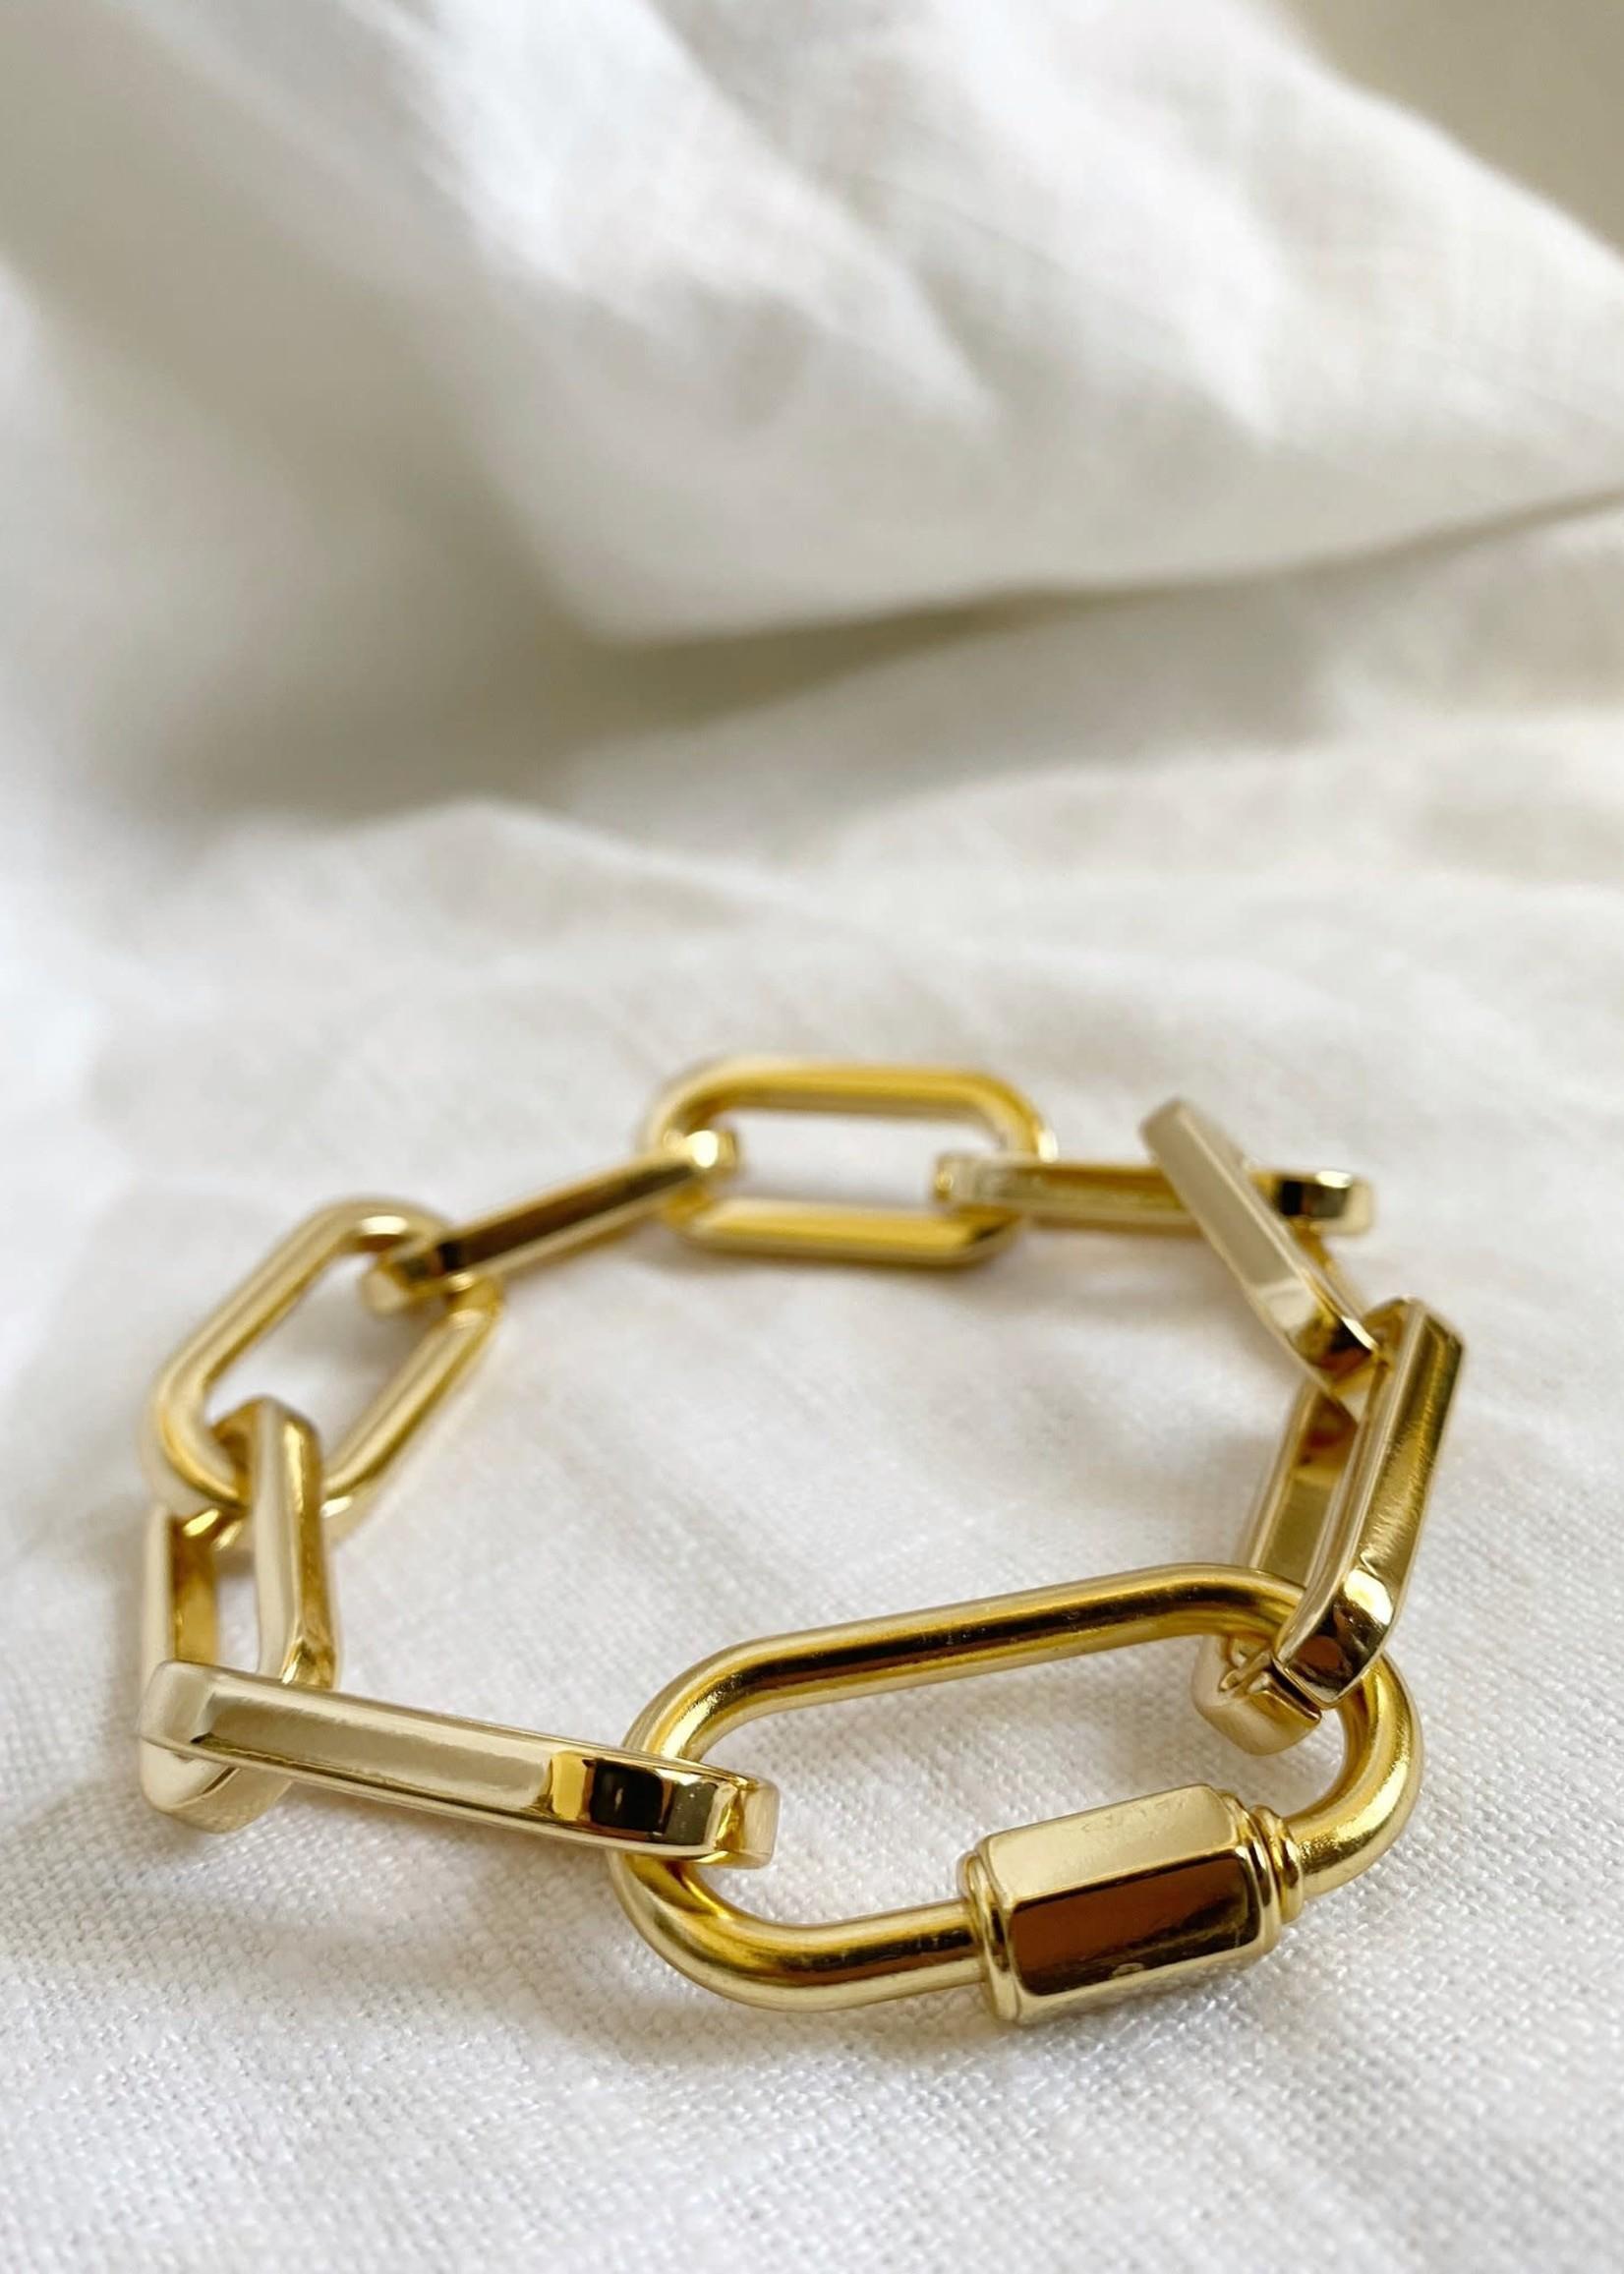 Bofemme Bofemme Bianca Gold Bracelet